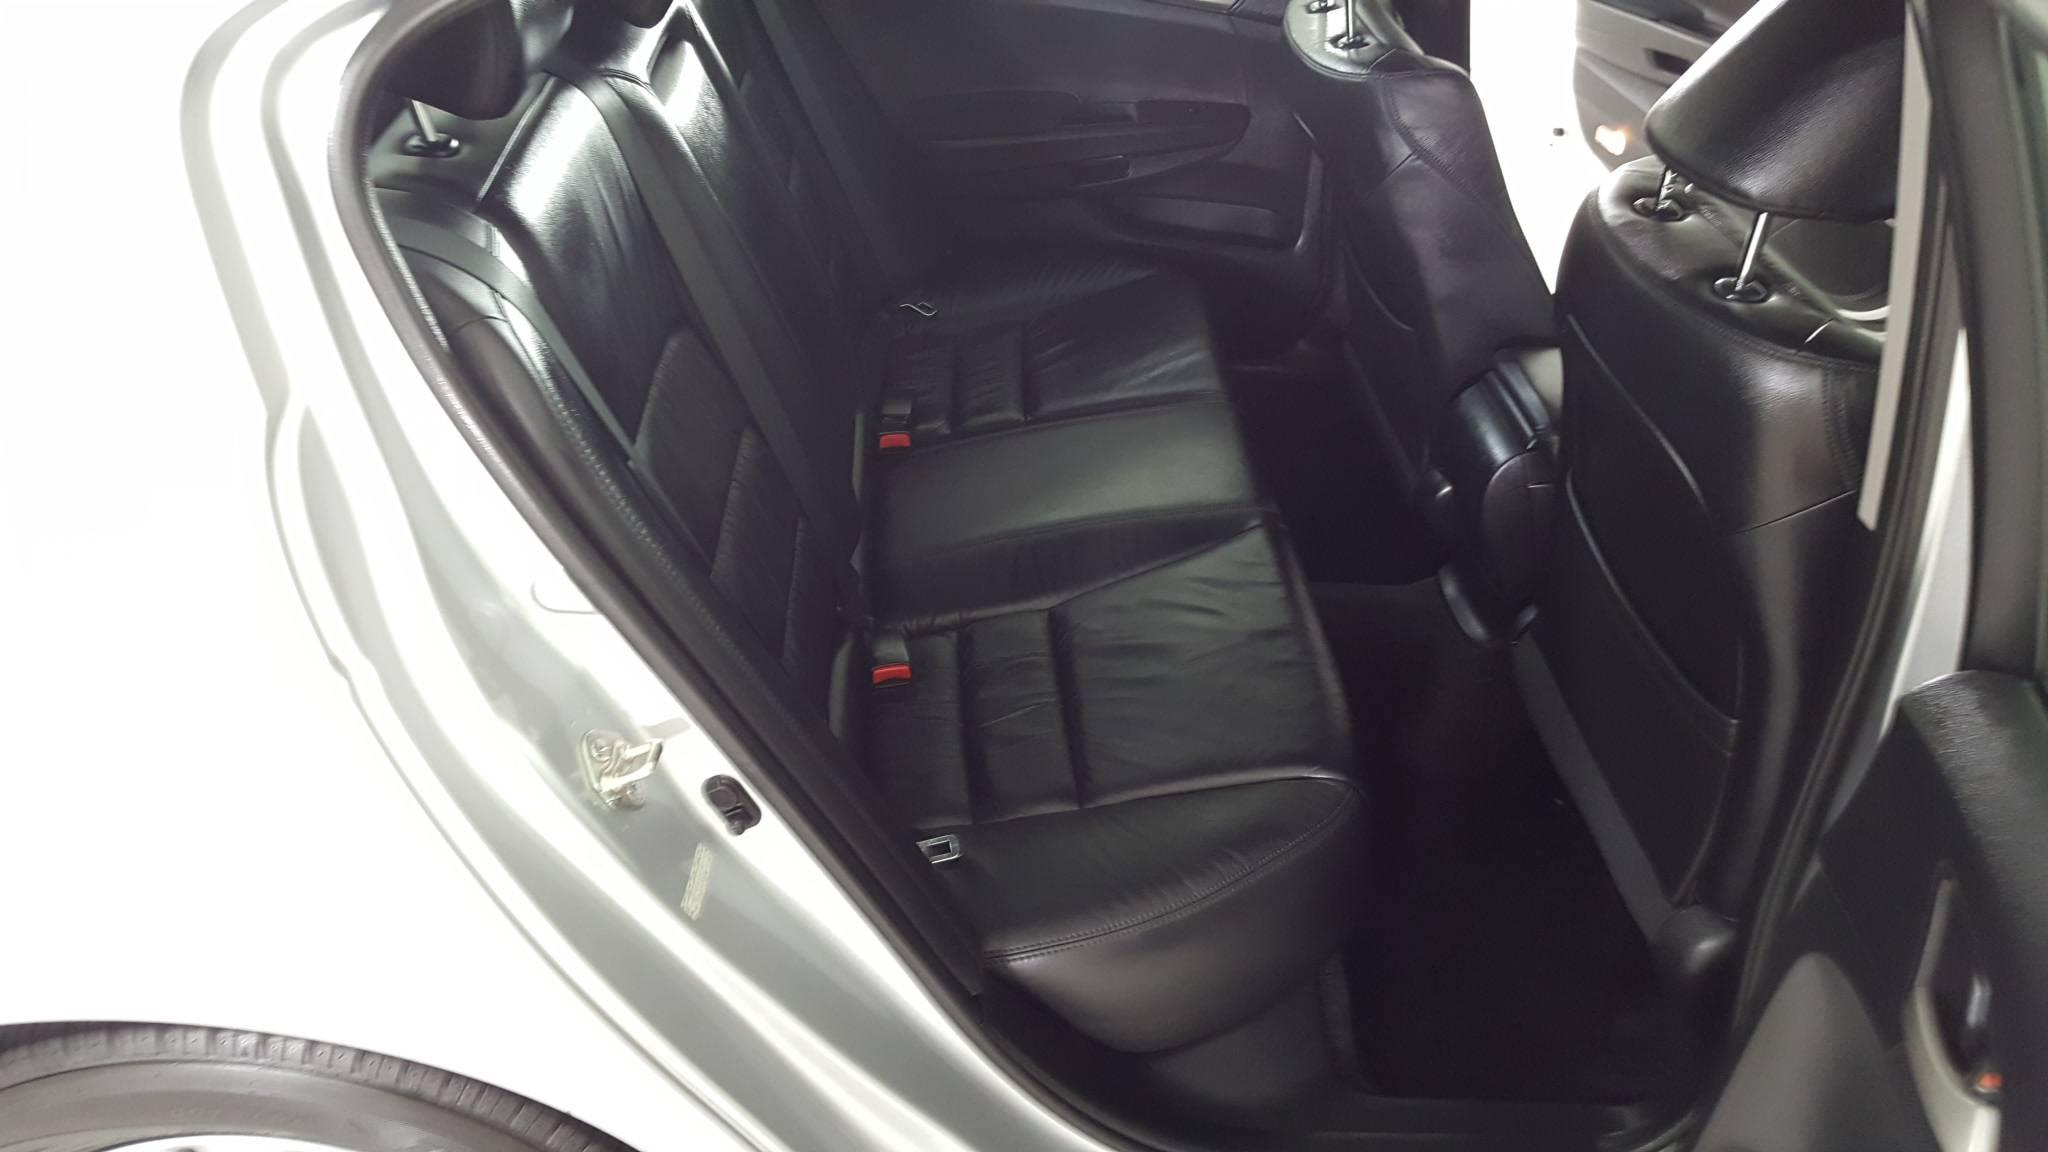 Pre-Owned 2012 Honda Accord SE